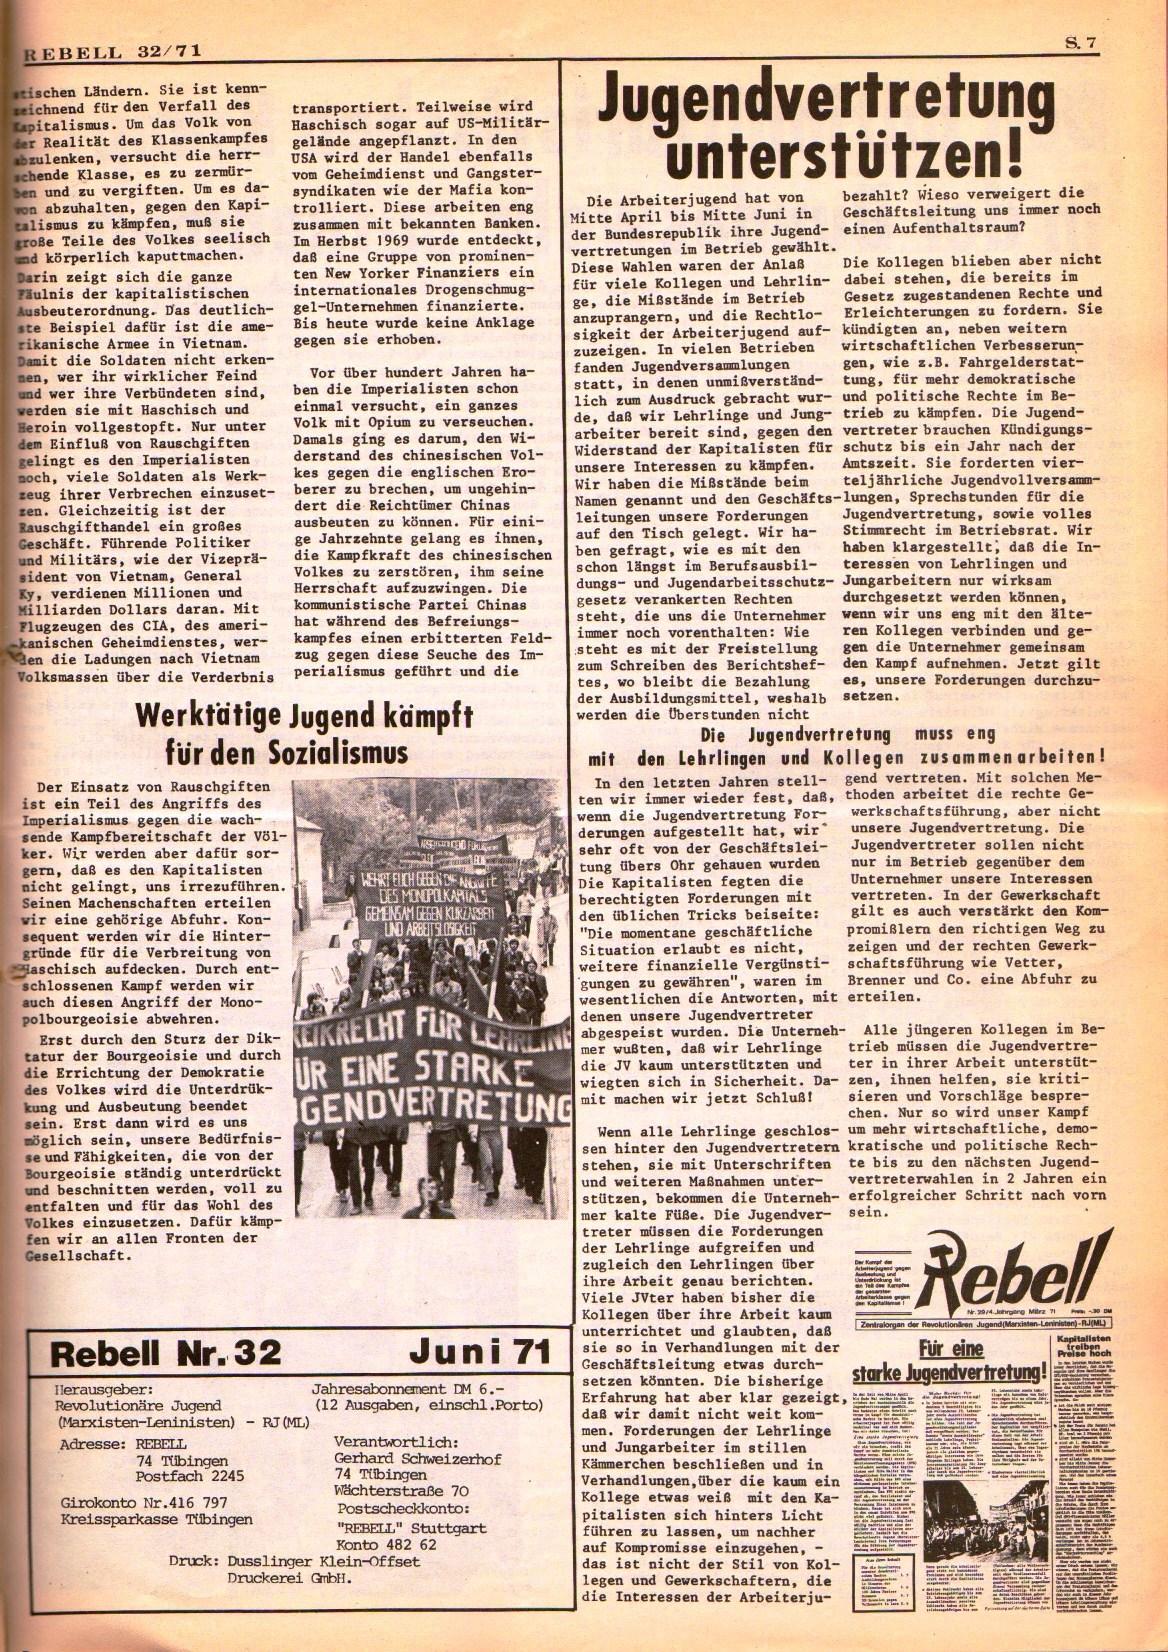 Rebell548